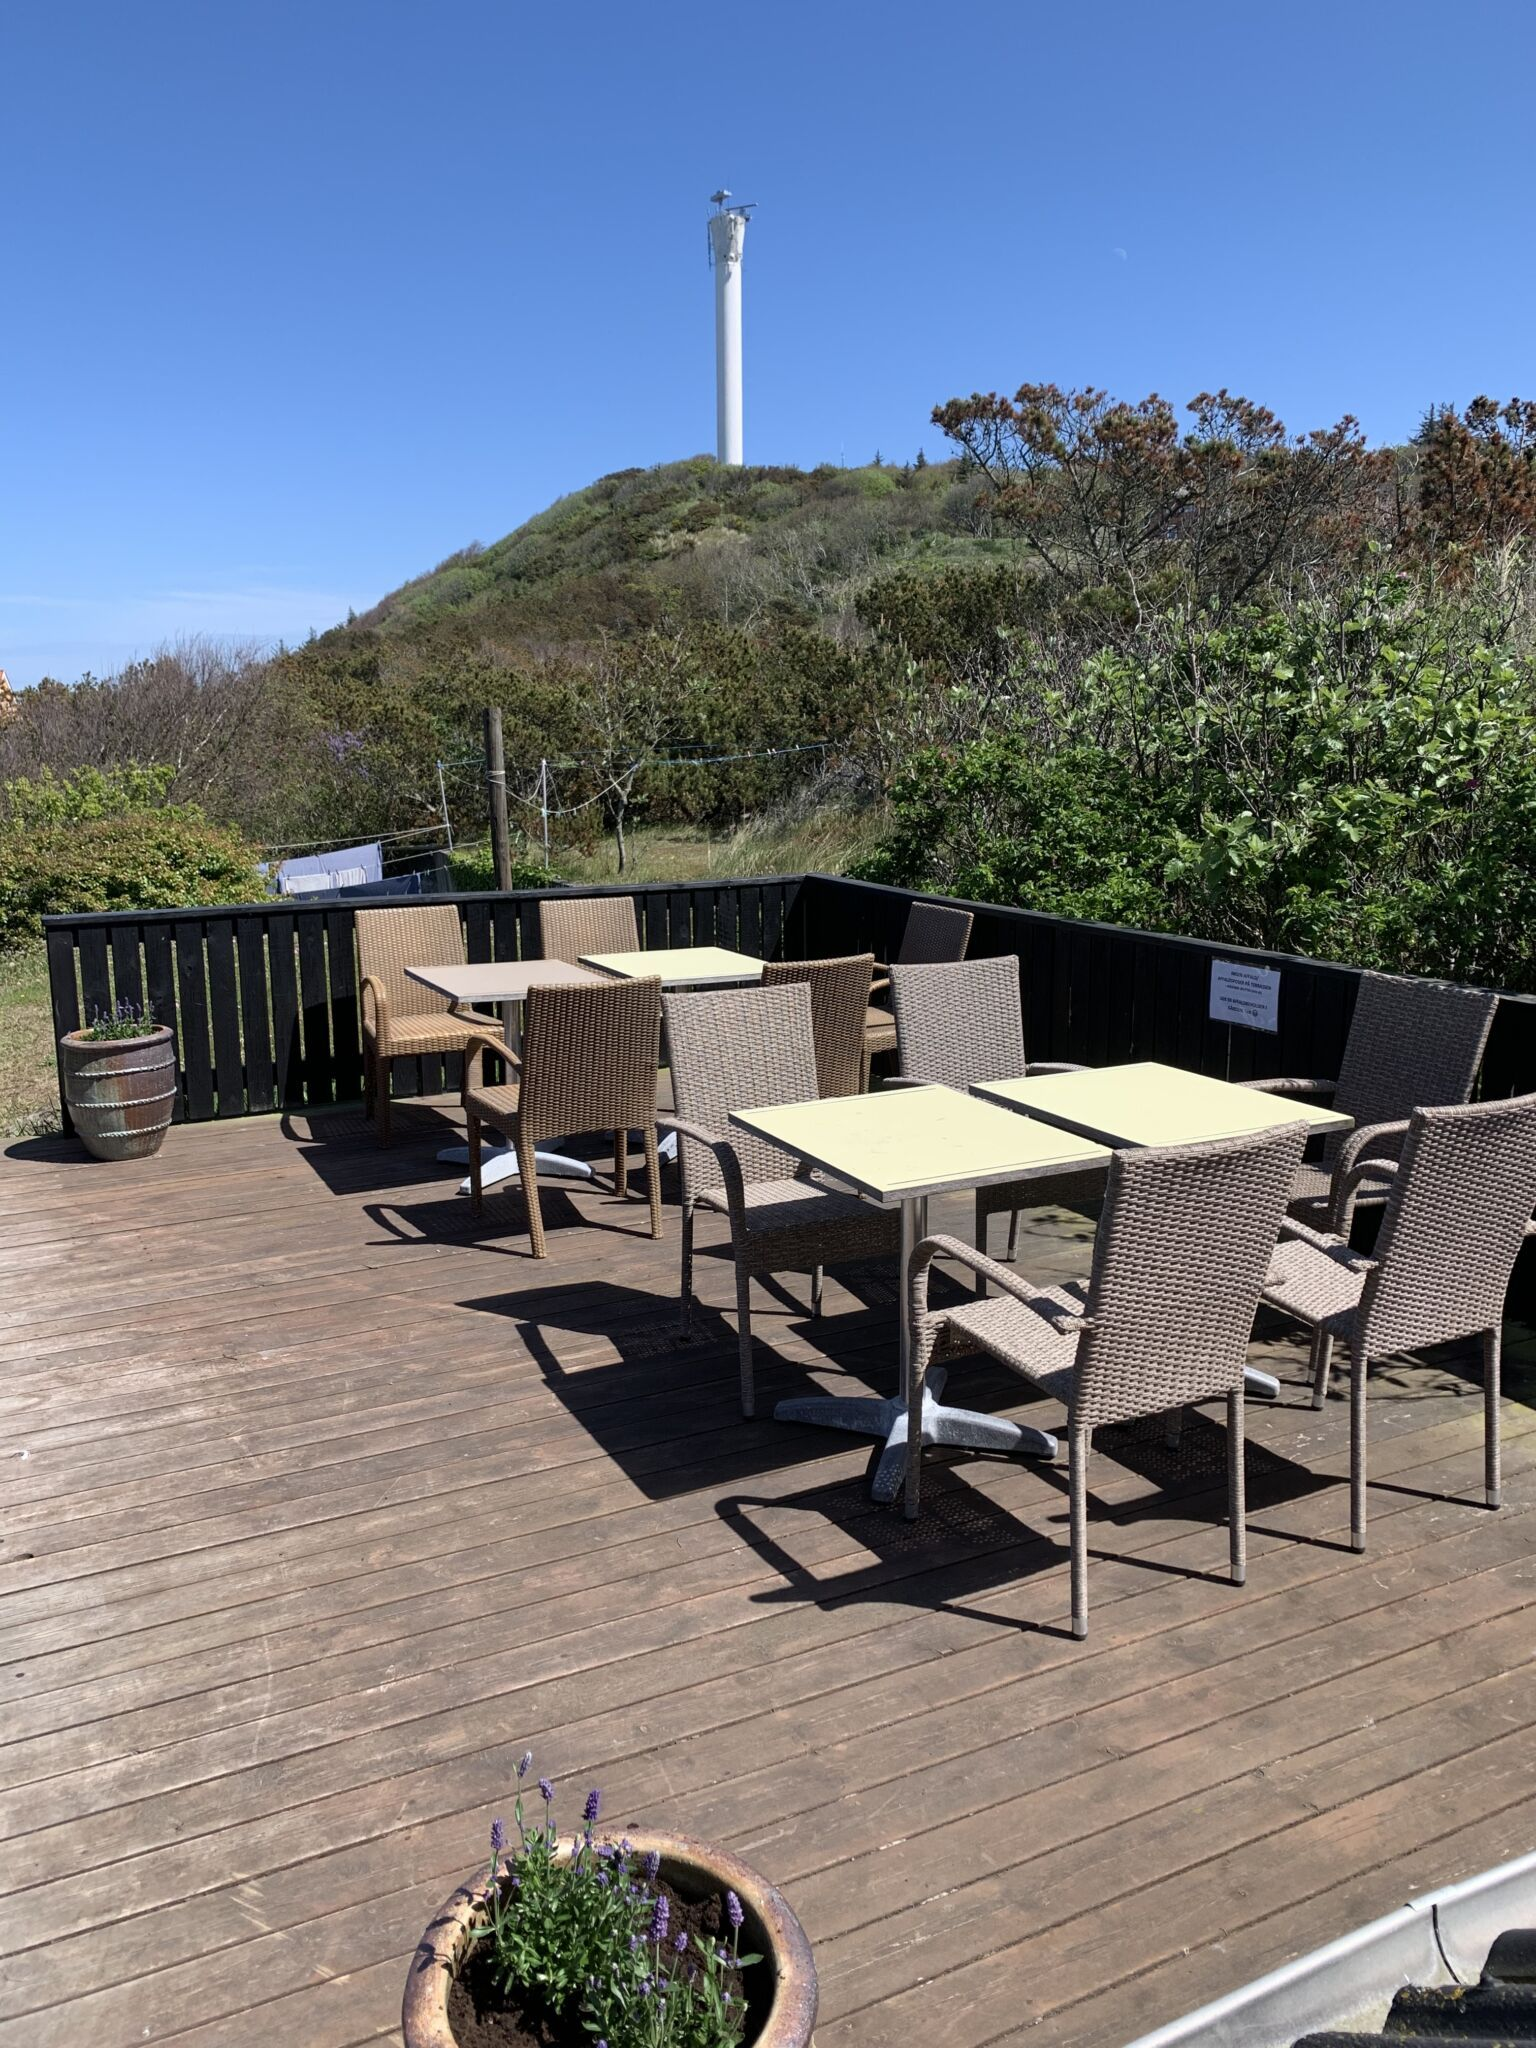 terrasse på anholt